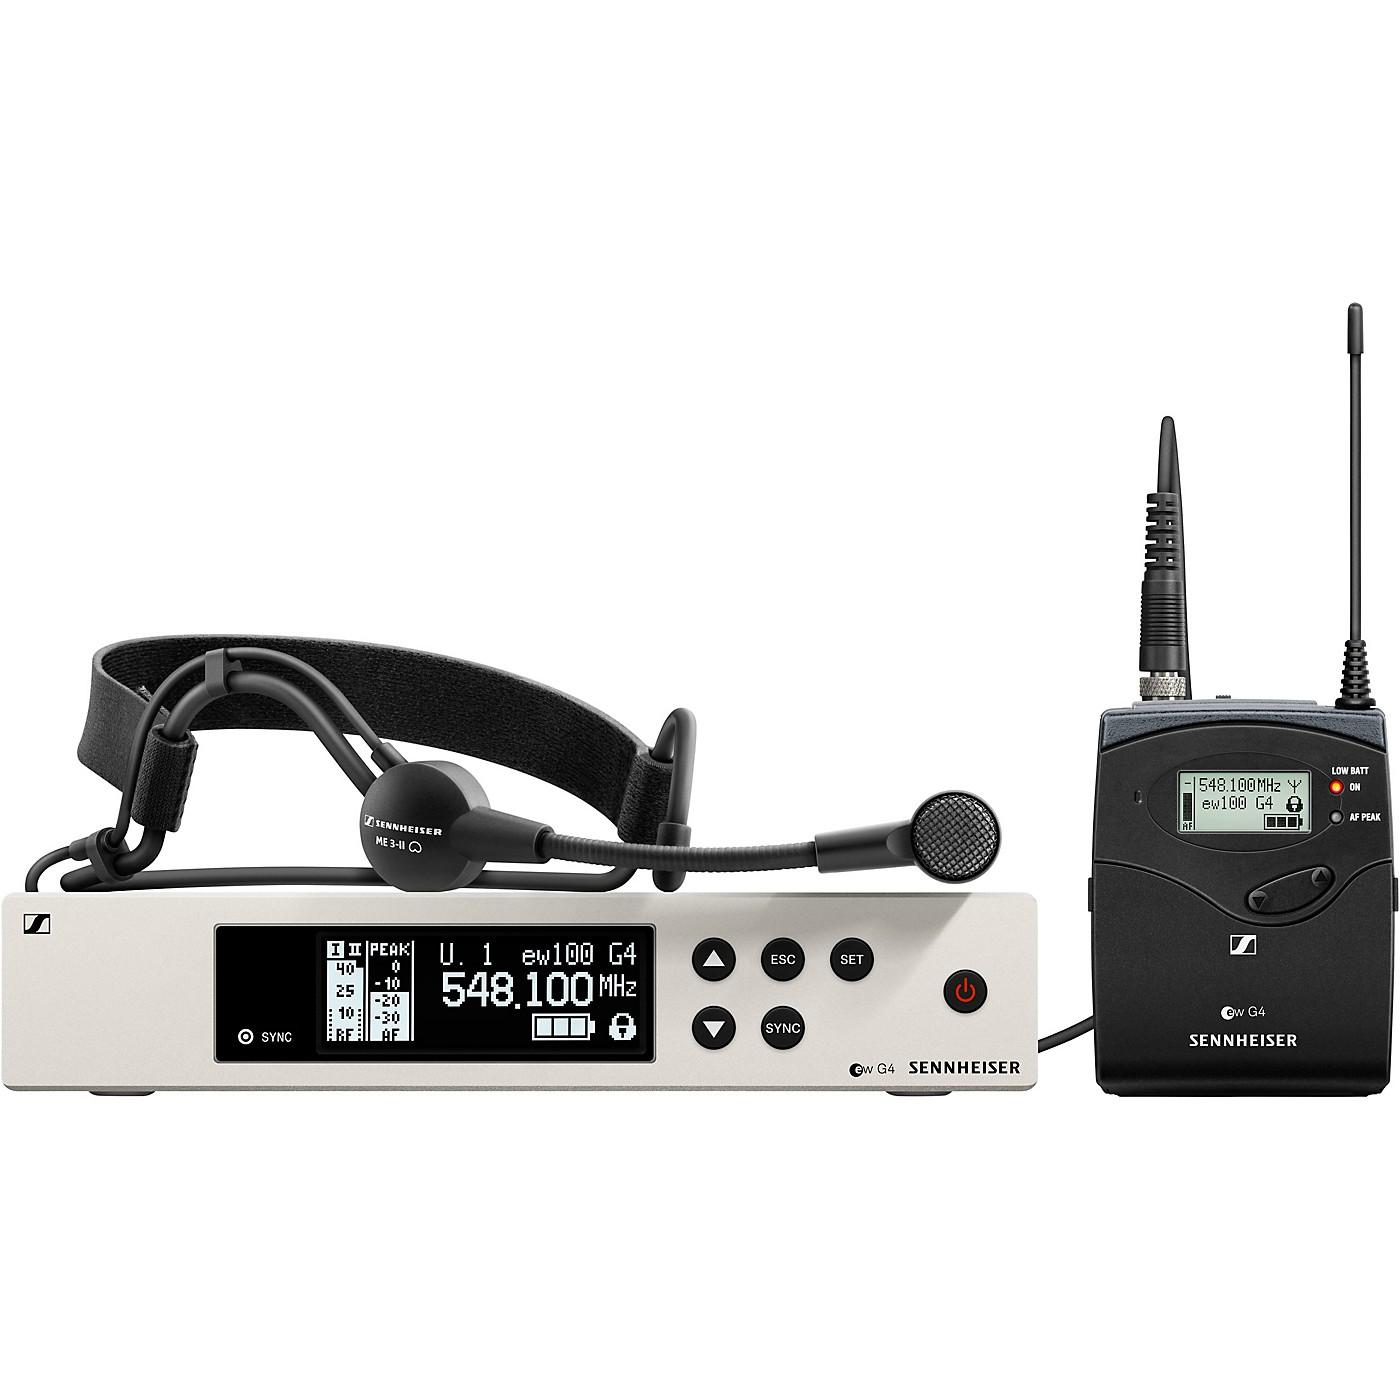 Sennheiser ew 100 G4 Headset Wireless System with ME3 Headset Mic thumbnail